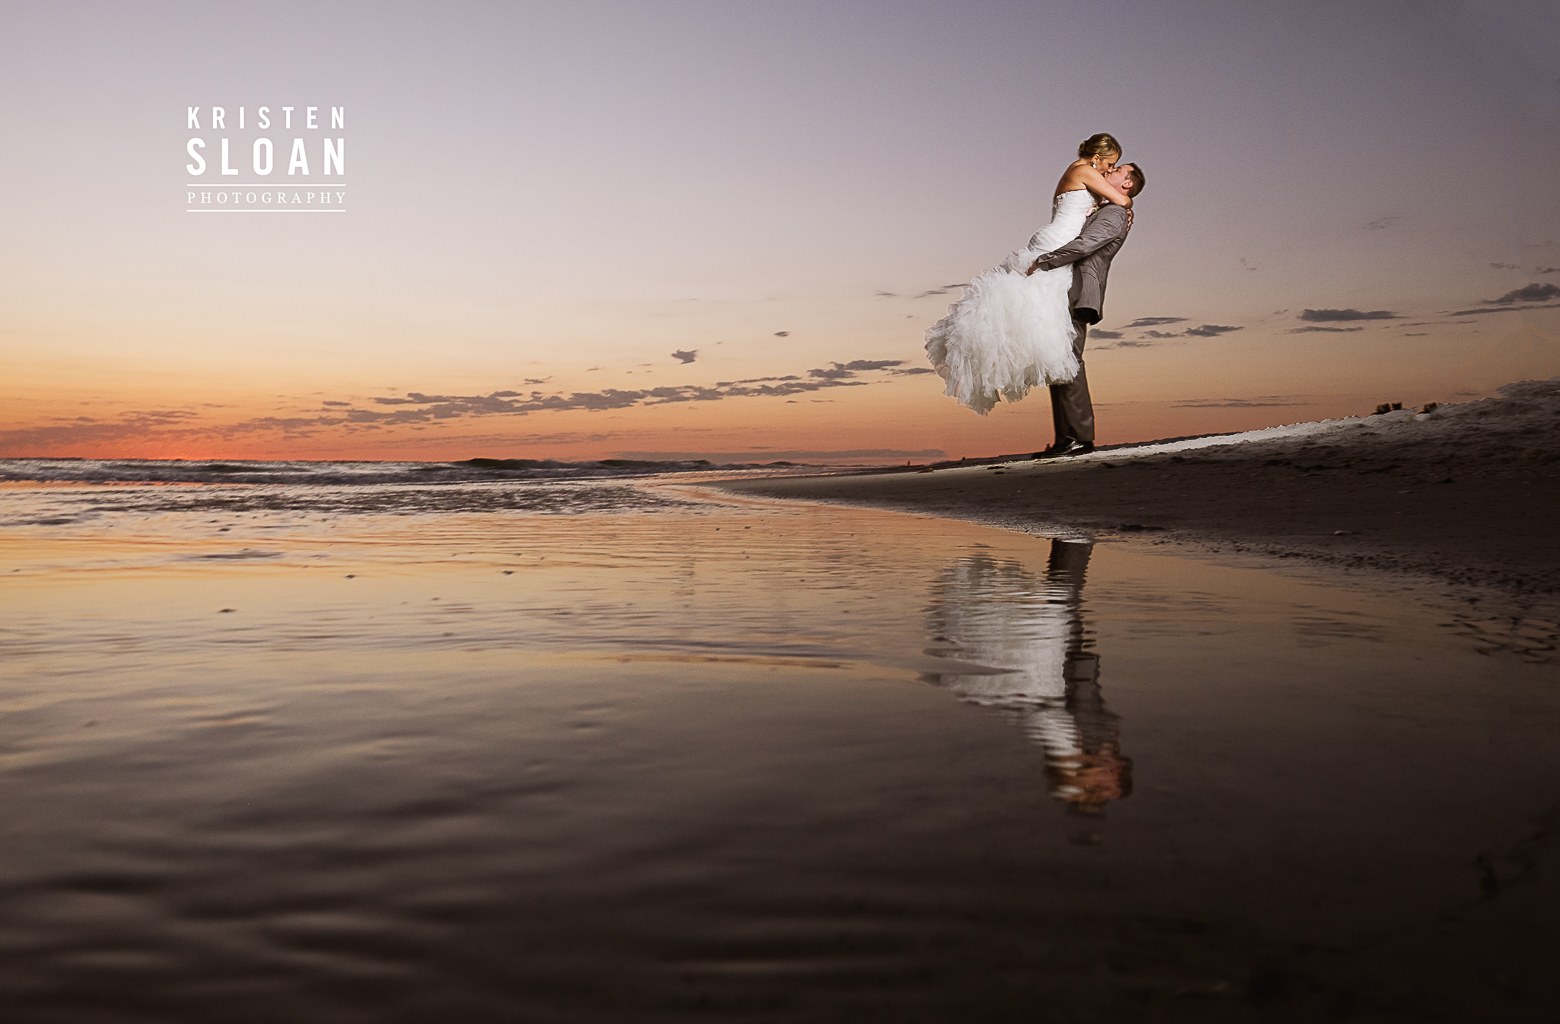 Anna Maria Island Florida Beach Wedding Photographer Kristen Sloan, Sandbar Restaurant Wedding Anna Maria Island, Florida Beach Wedding Sunset Bride and Groom